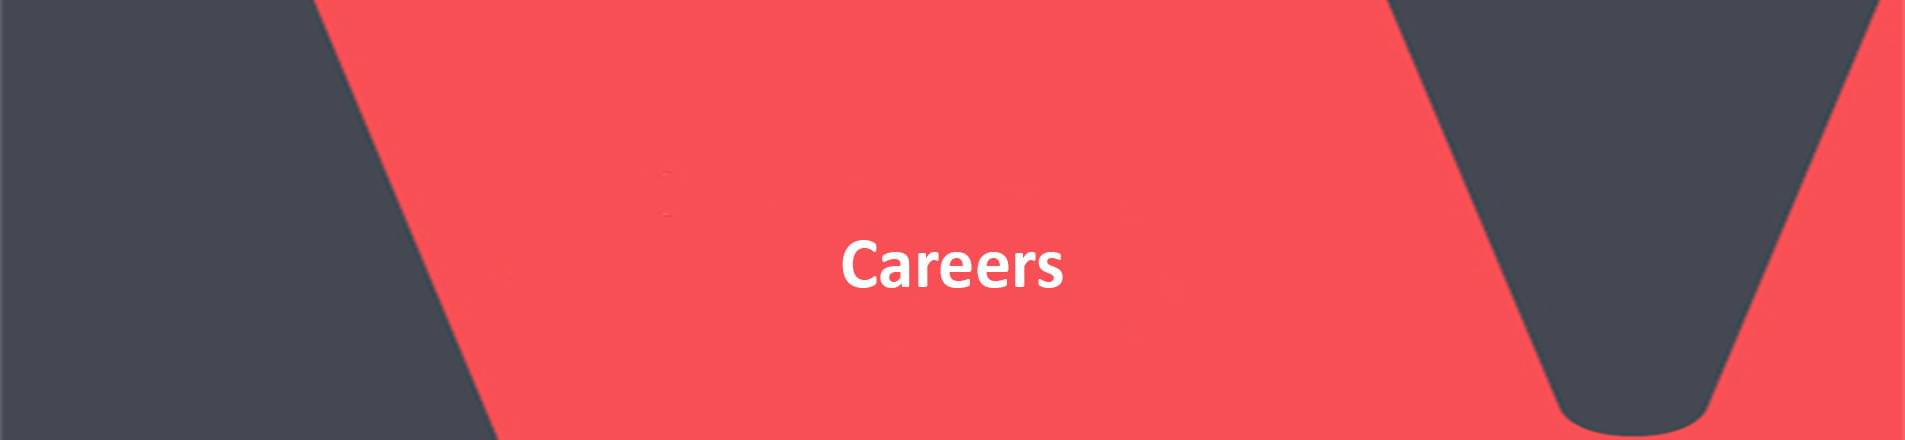 Word careers on red VERCIDA branded background